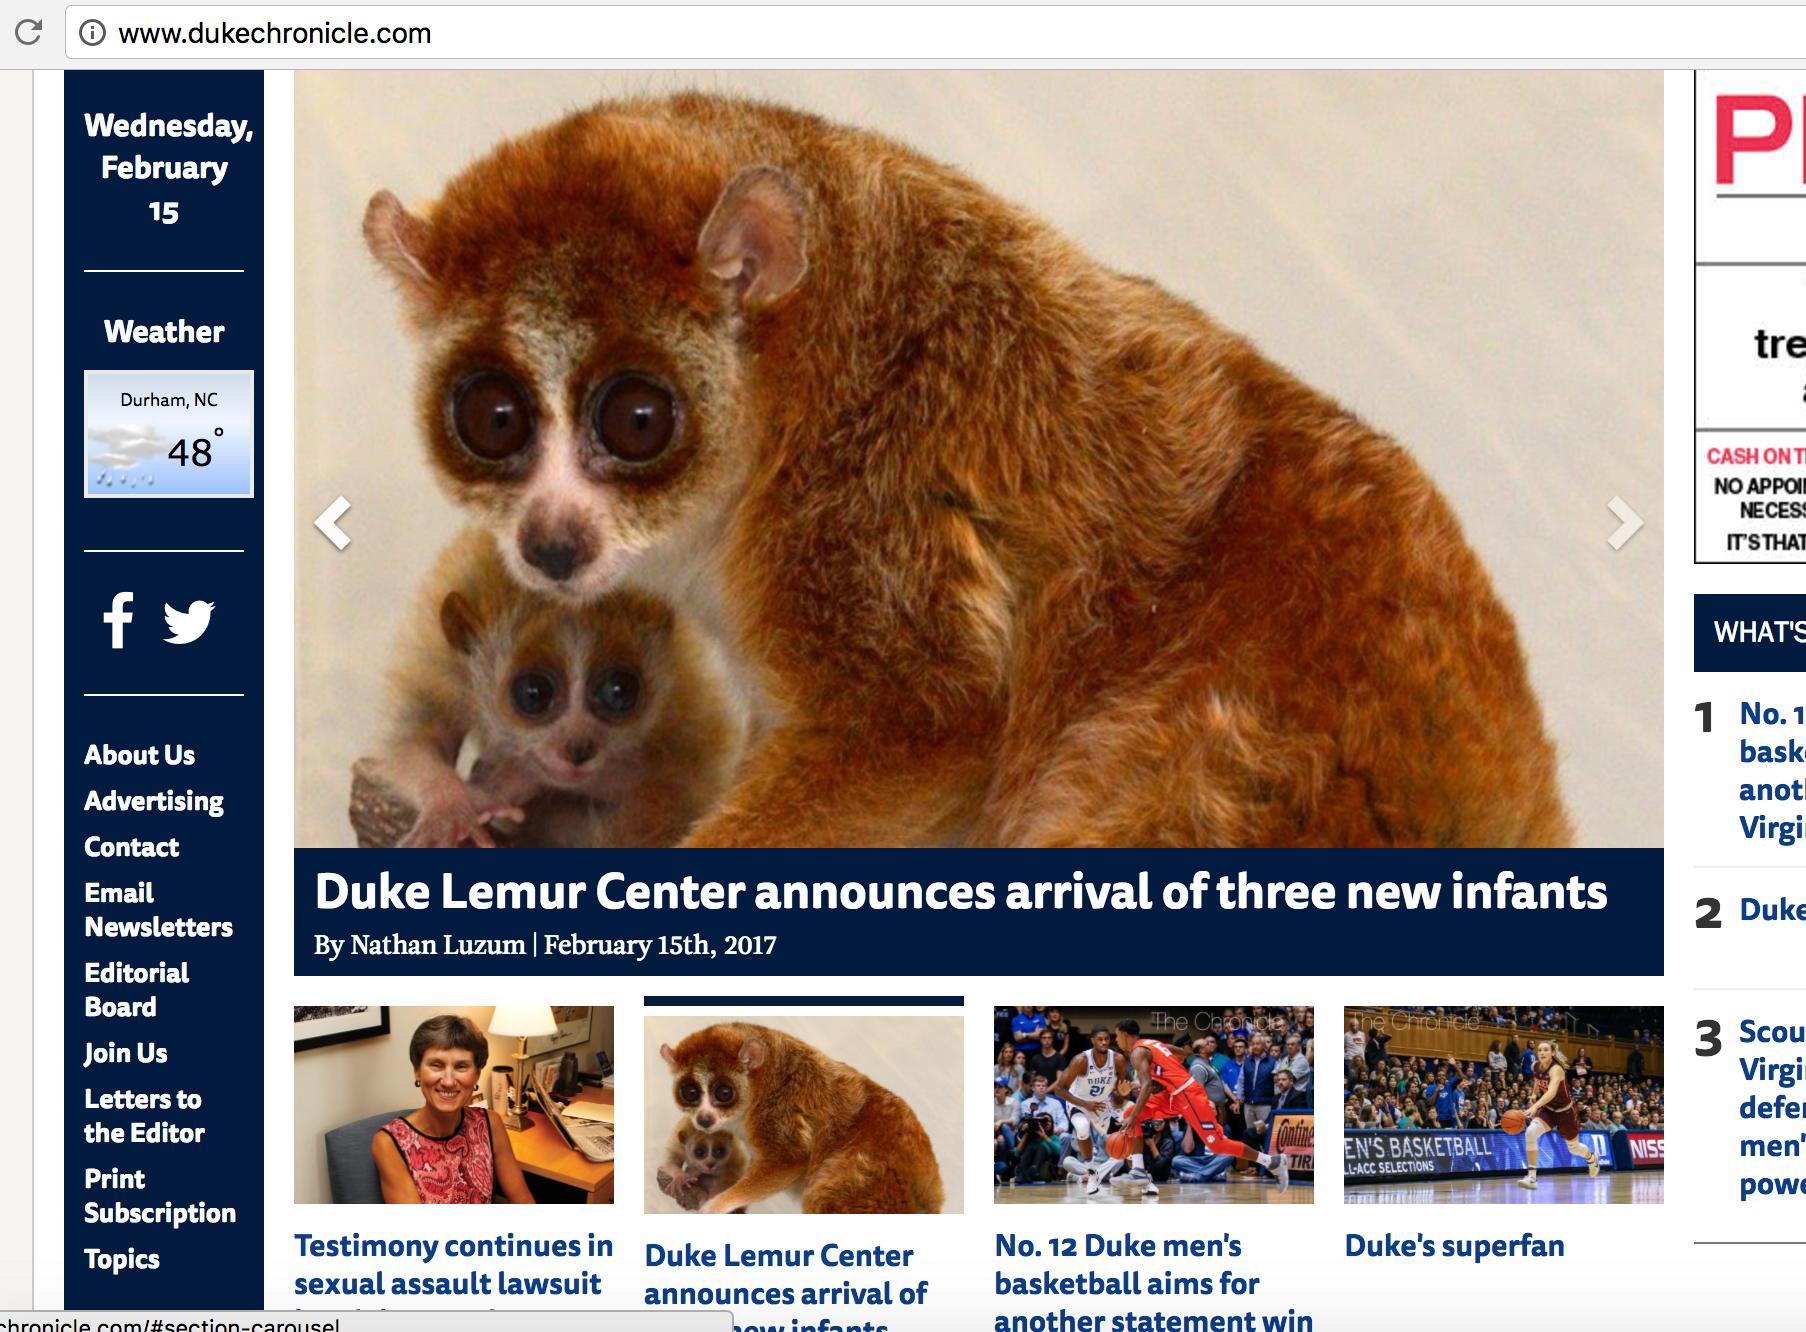 baby pygmy slow loris infant duke lemur center chronicle